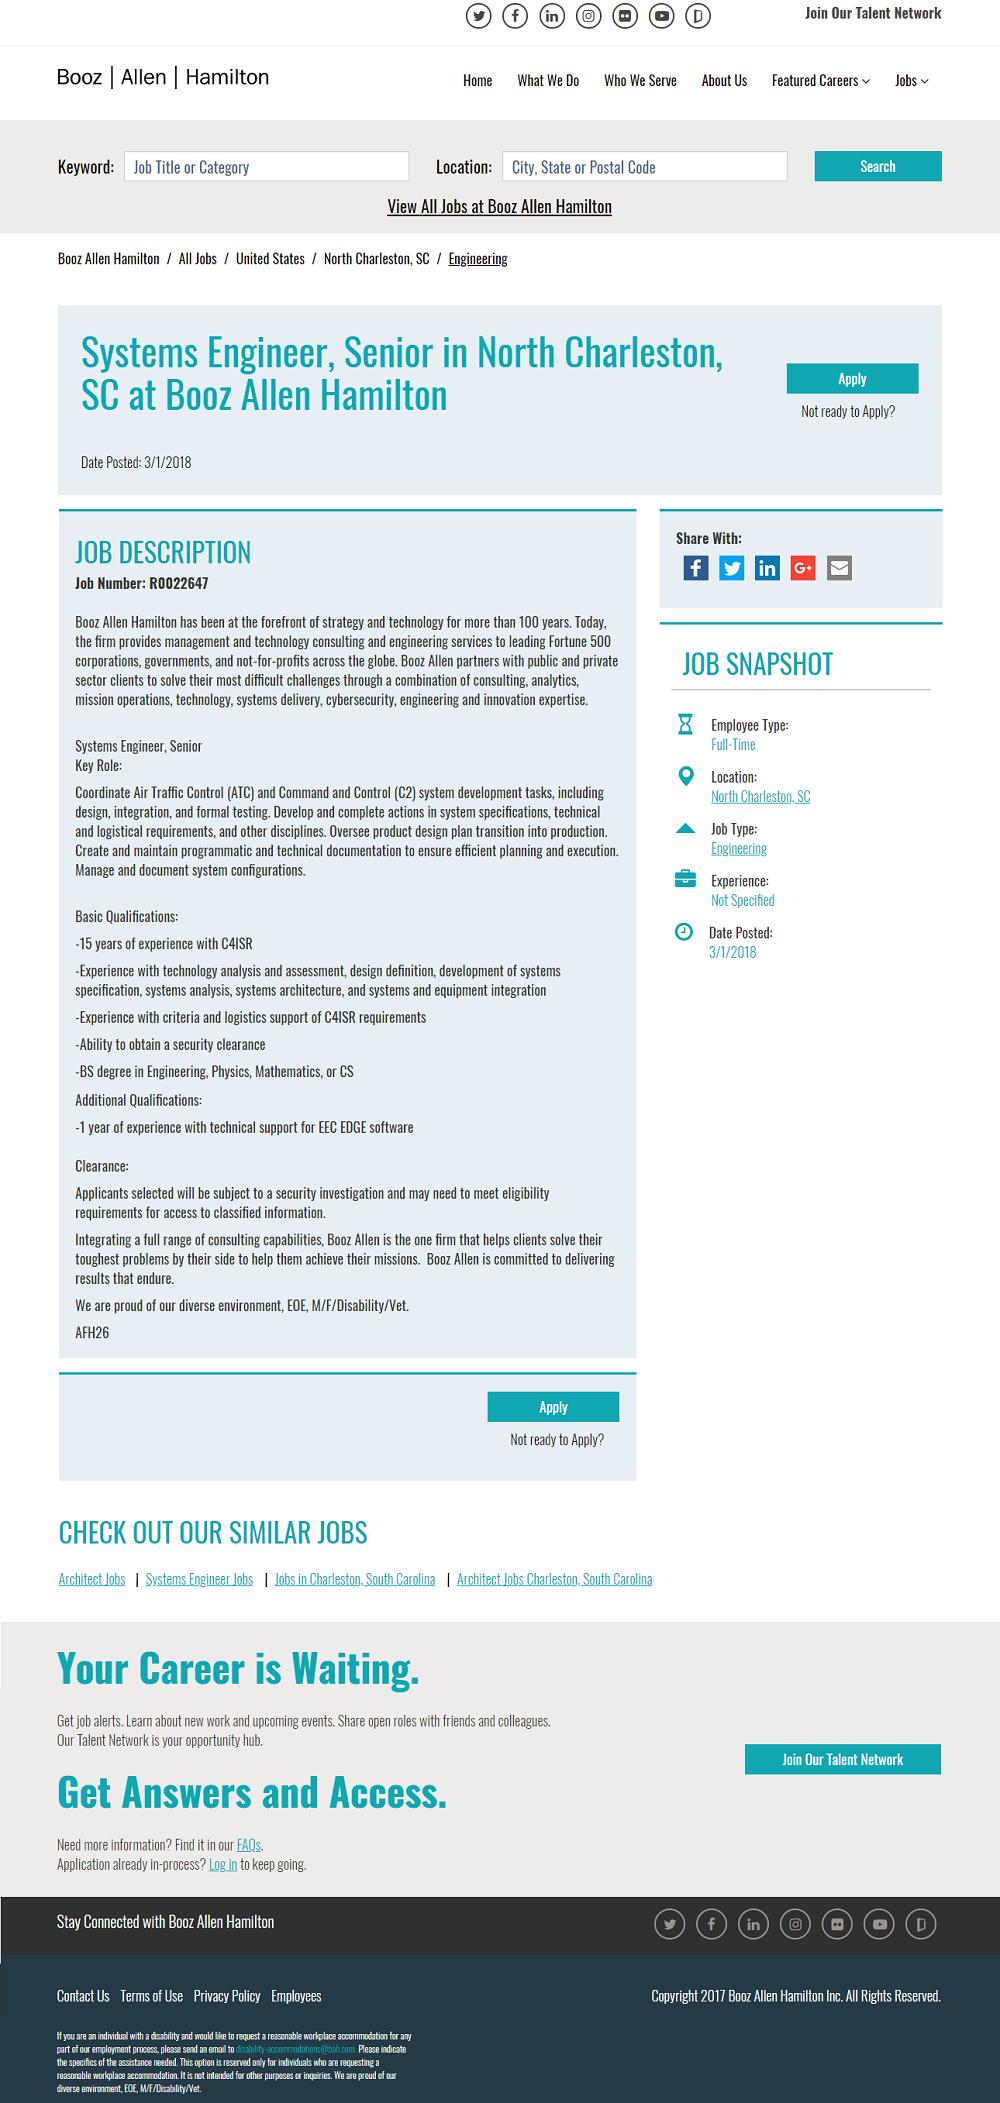 Workday ATS Job Page Overlay - Booz Allen Hamilton